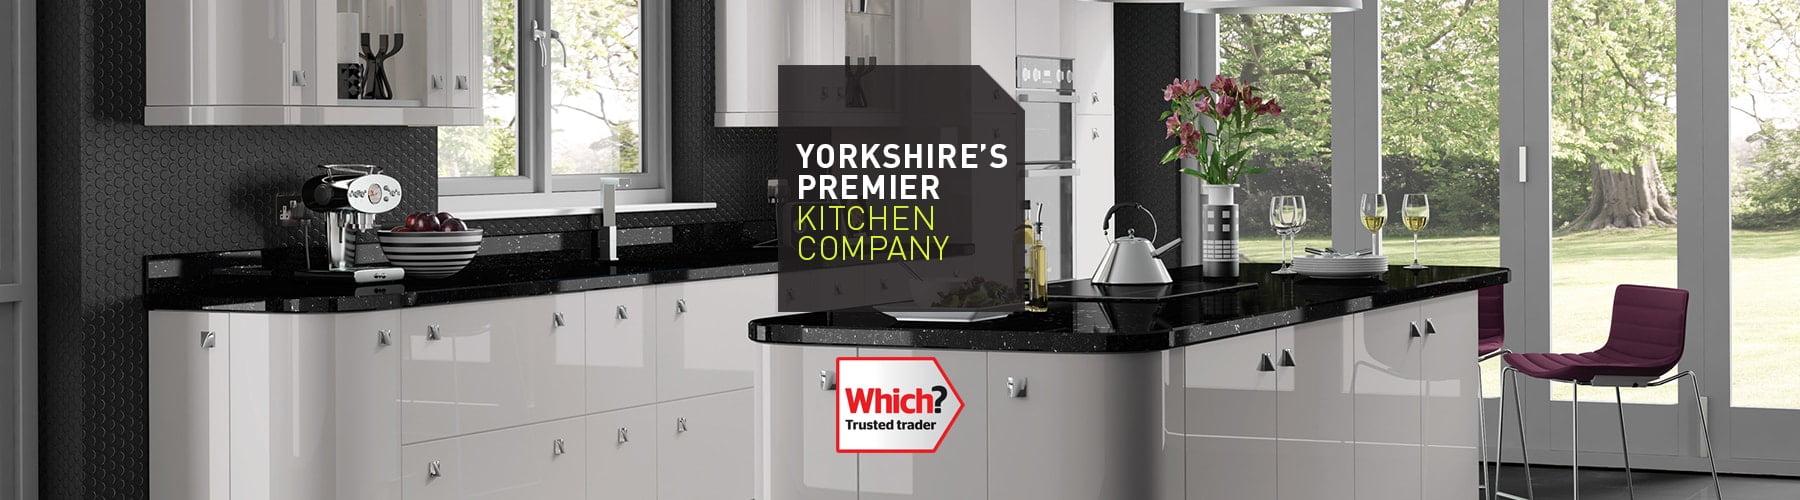 yorkshires premier kitchen company home banner